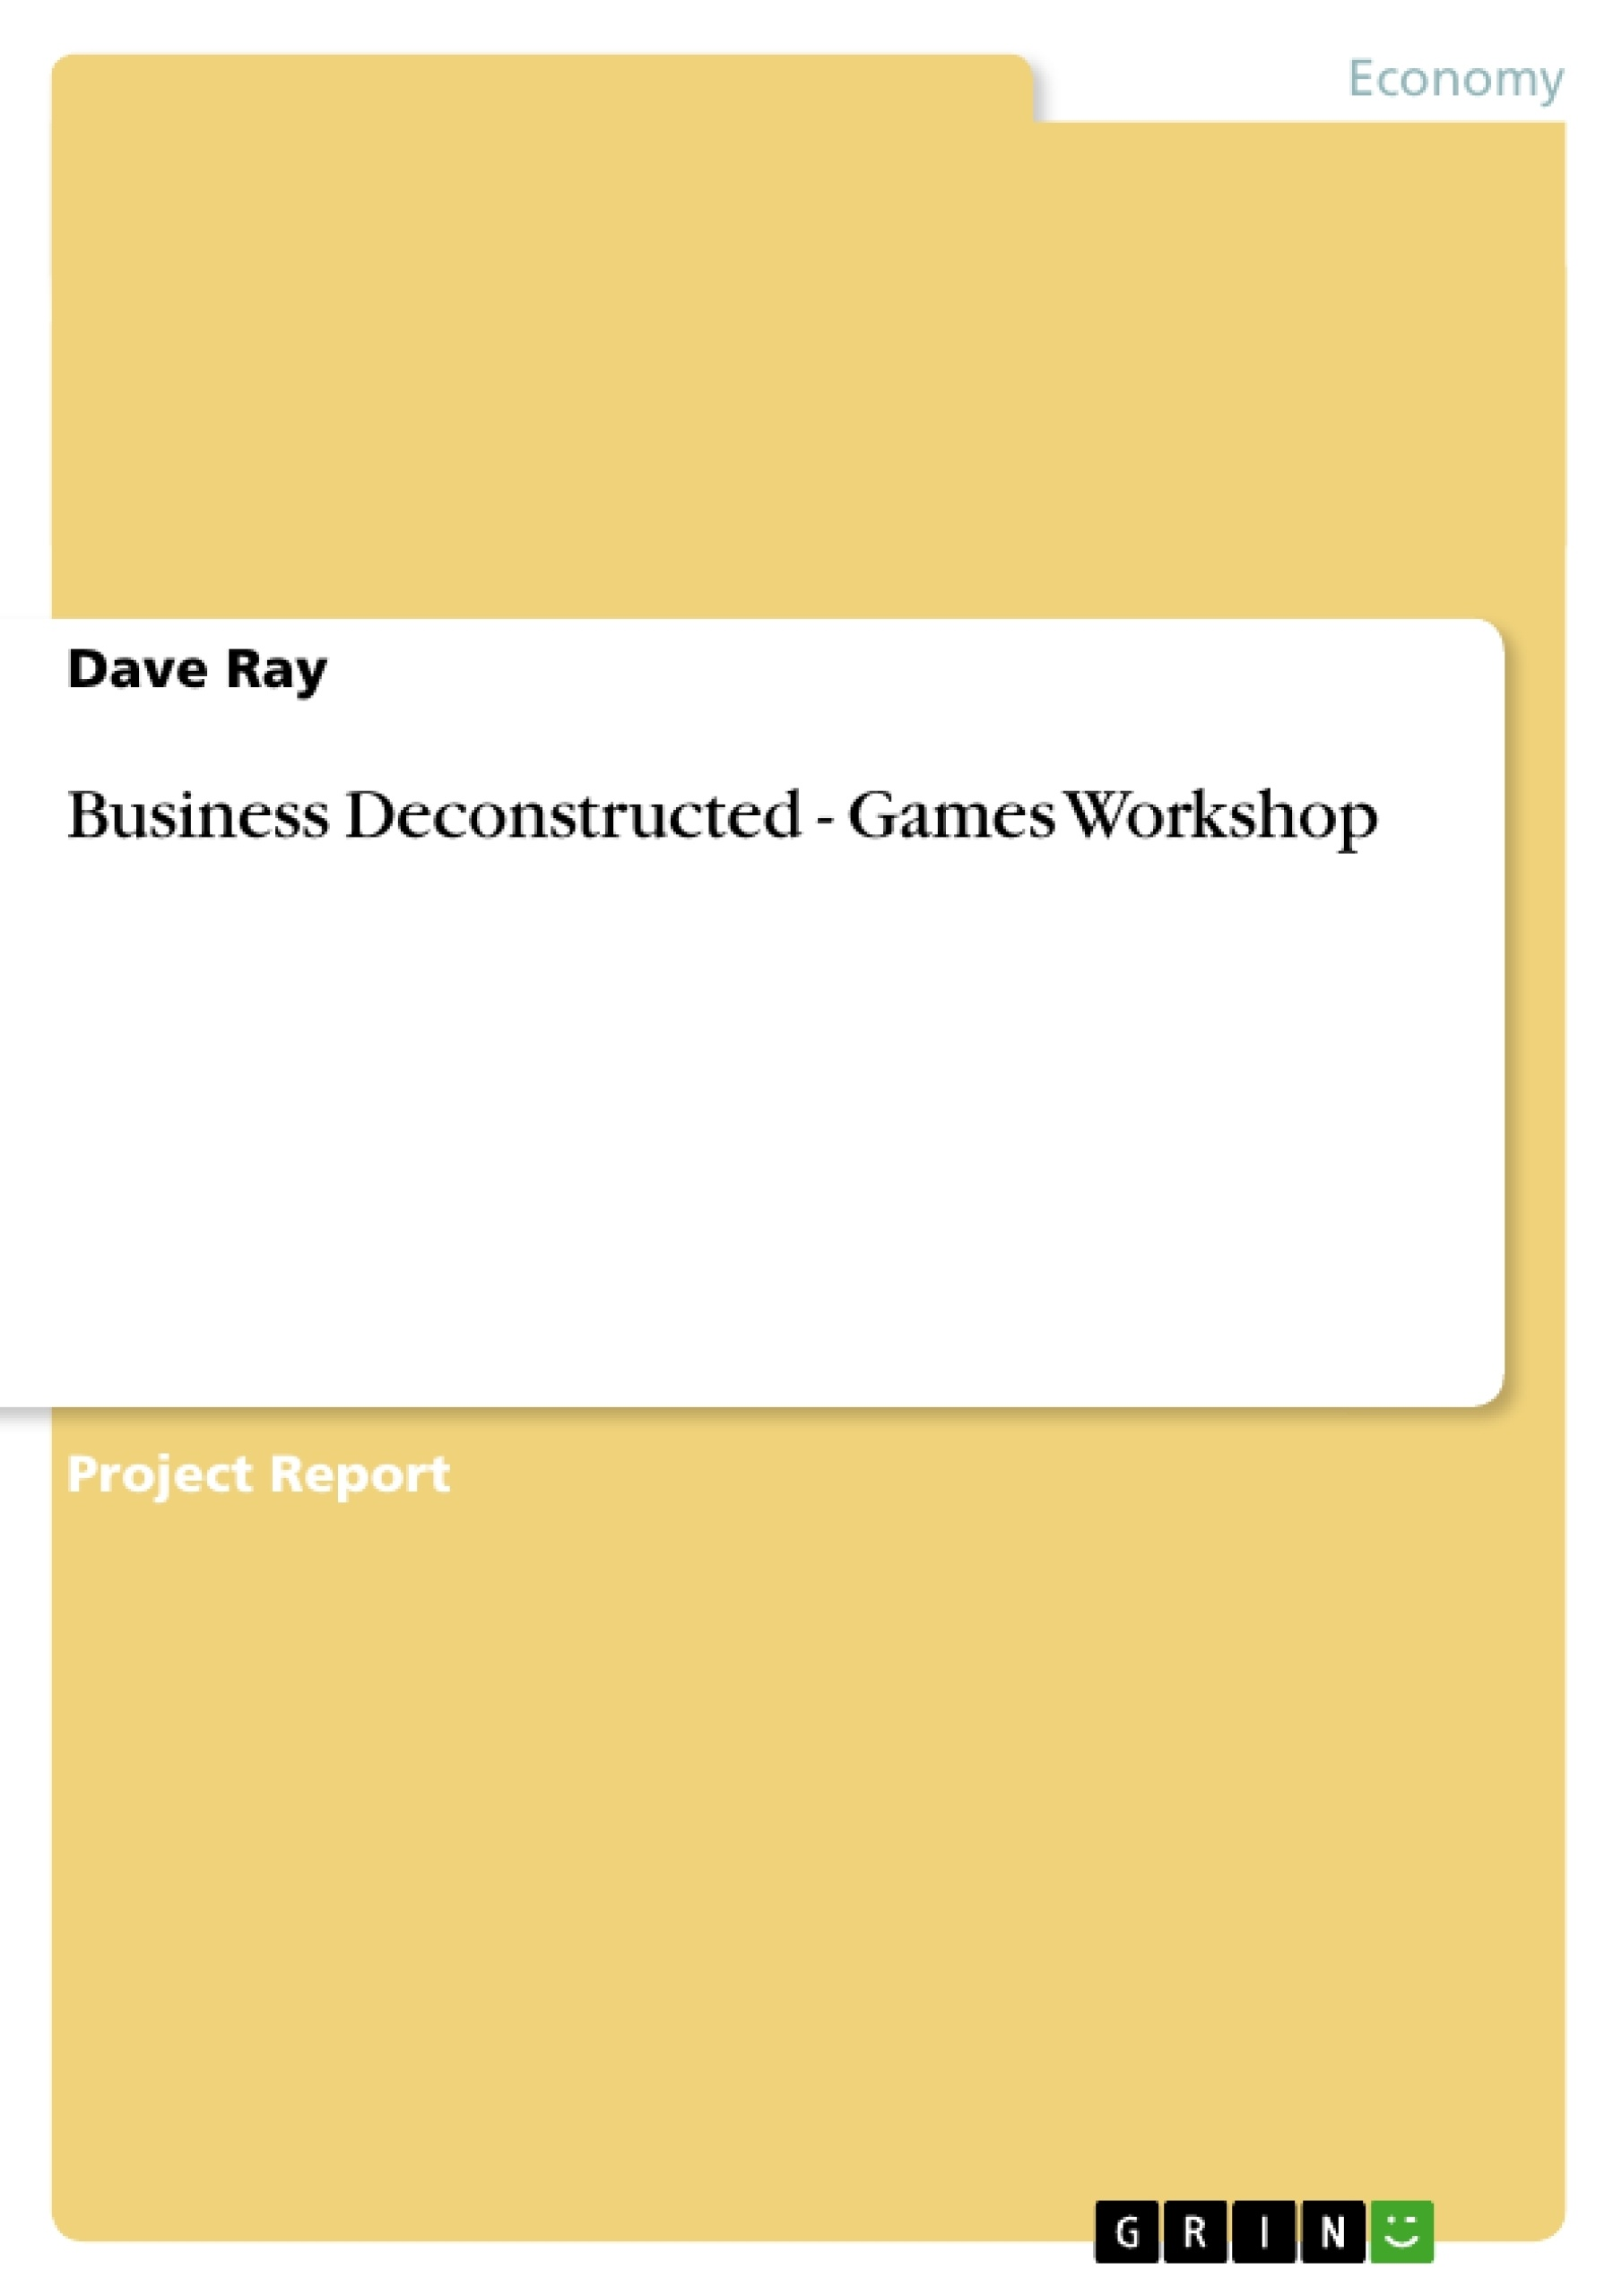 Title: Business Deconstructed - Games Workshop